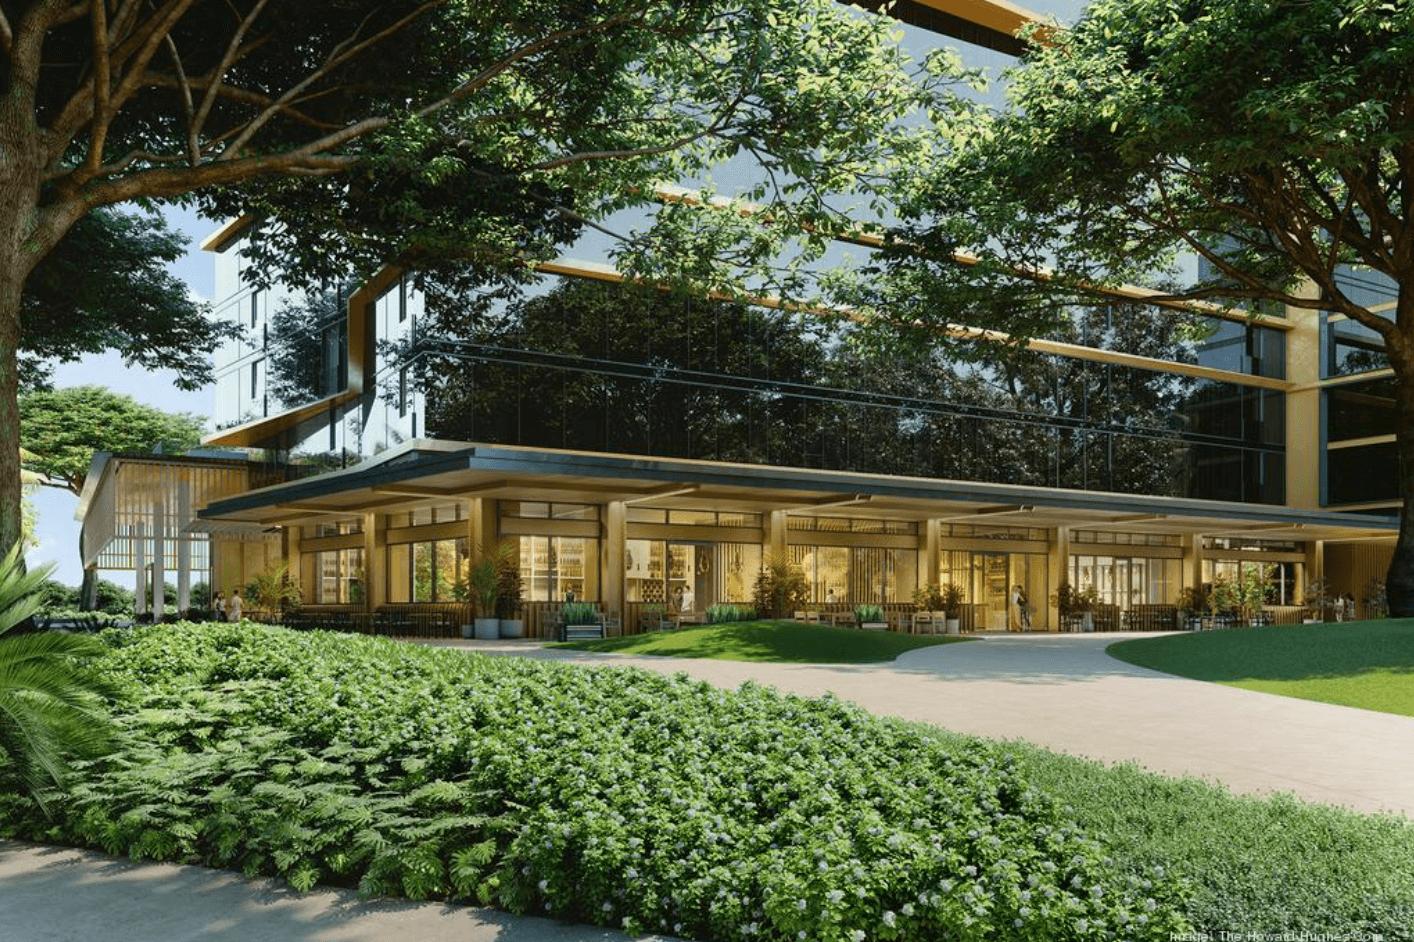 The Park on Ward